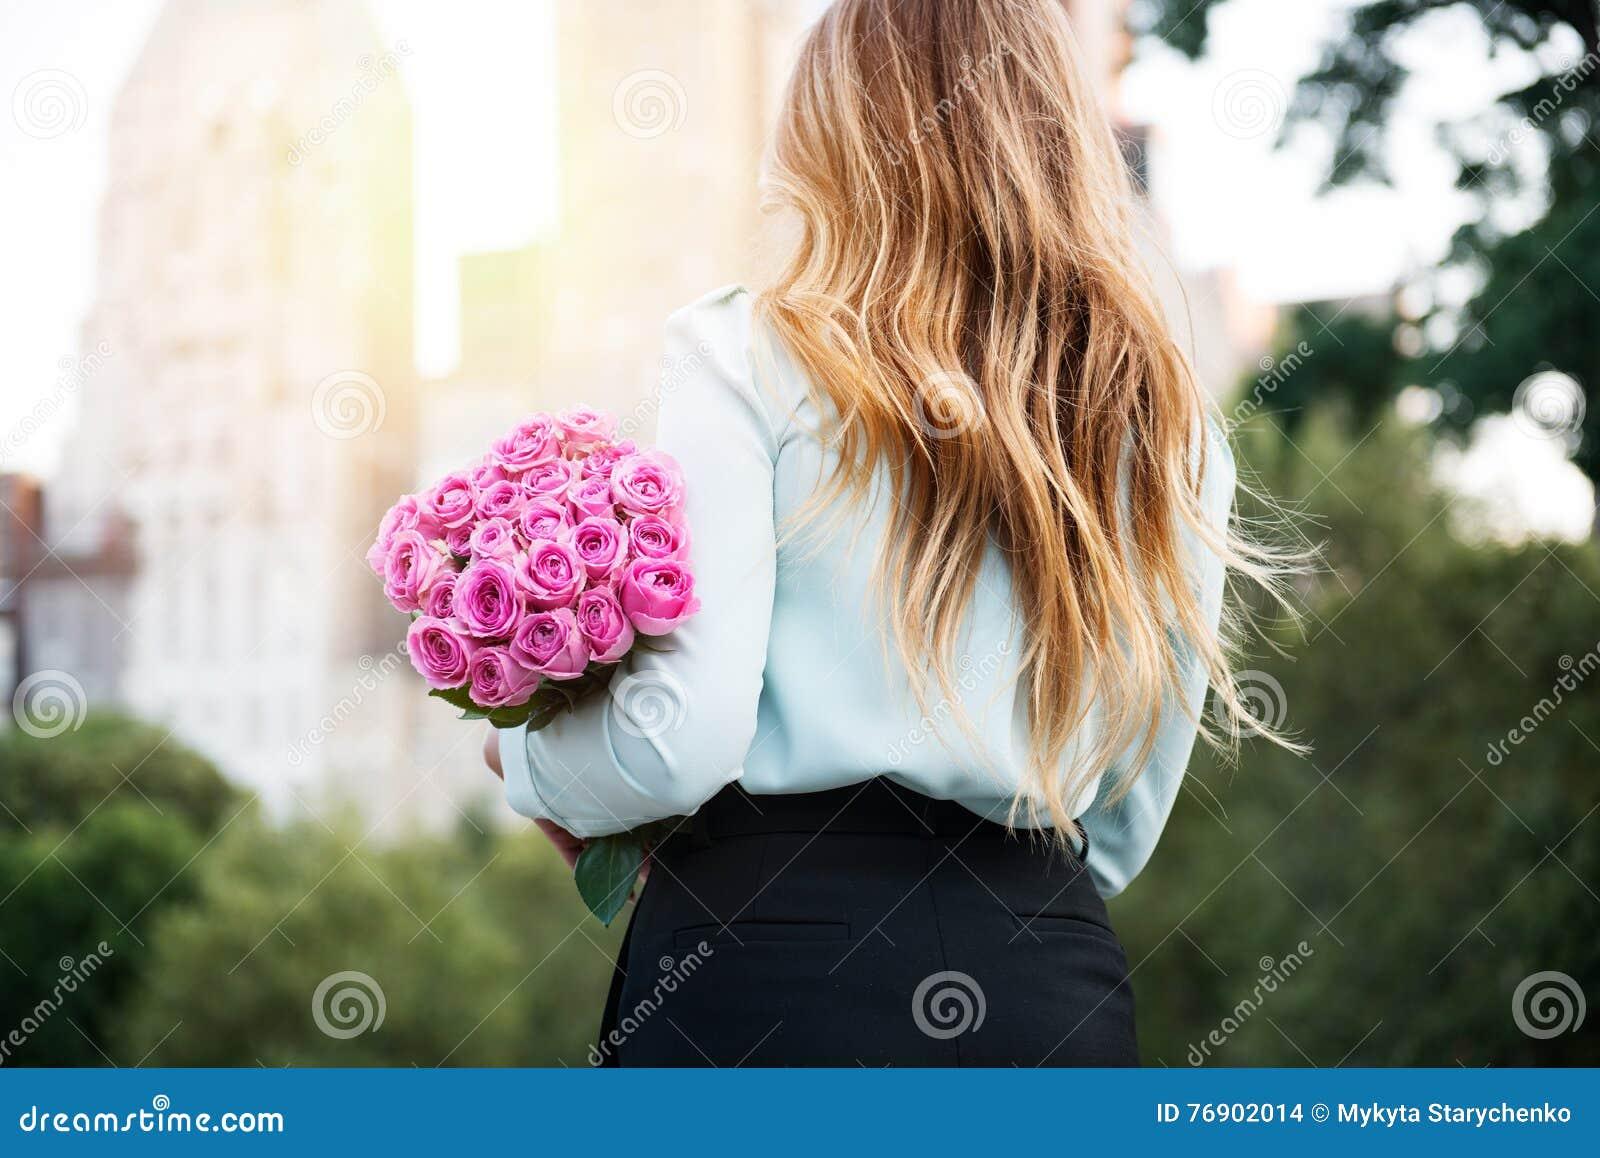 flower dating